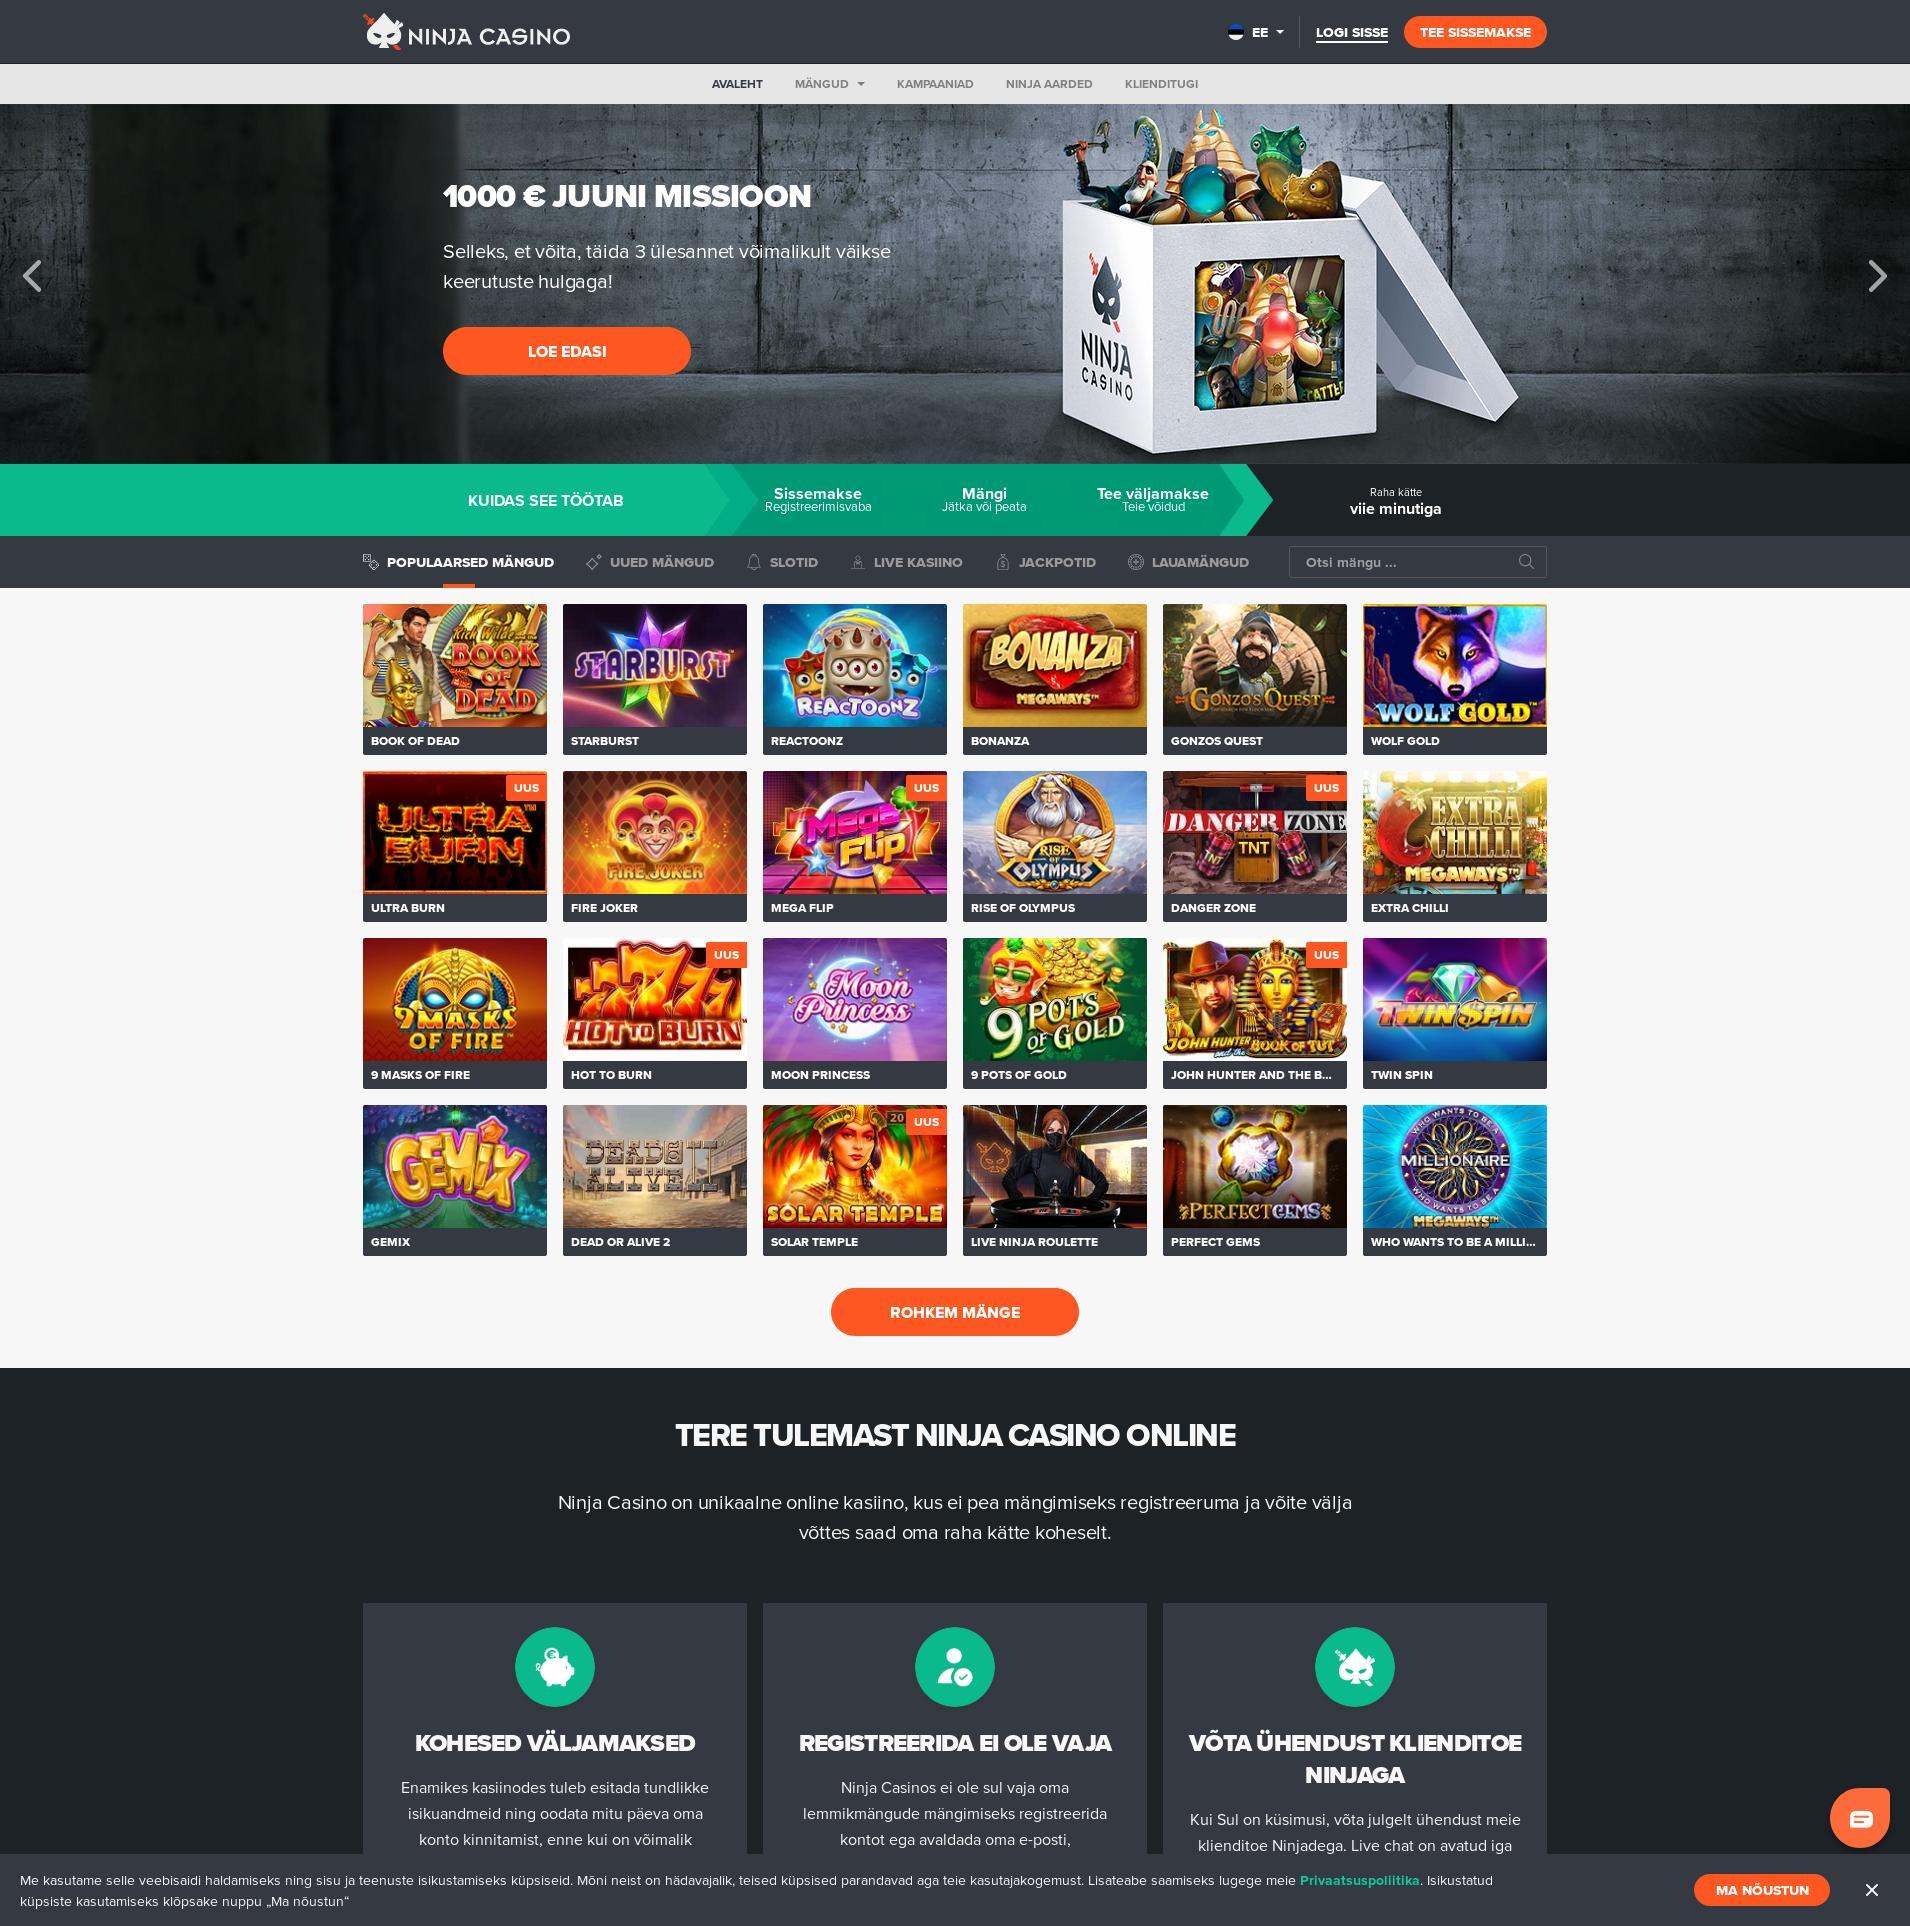 Casino screen Lobby 2020-06-06 pentru Estonia